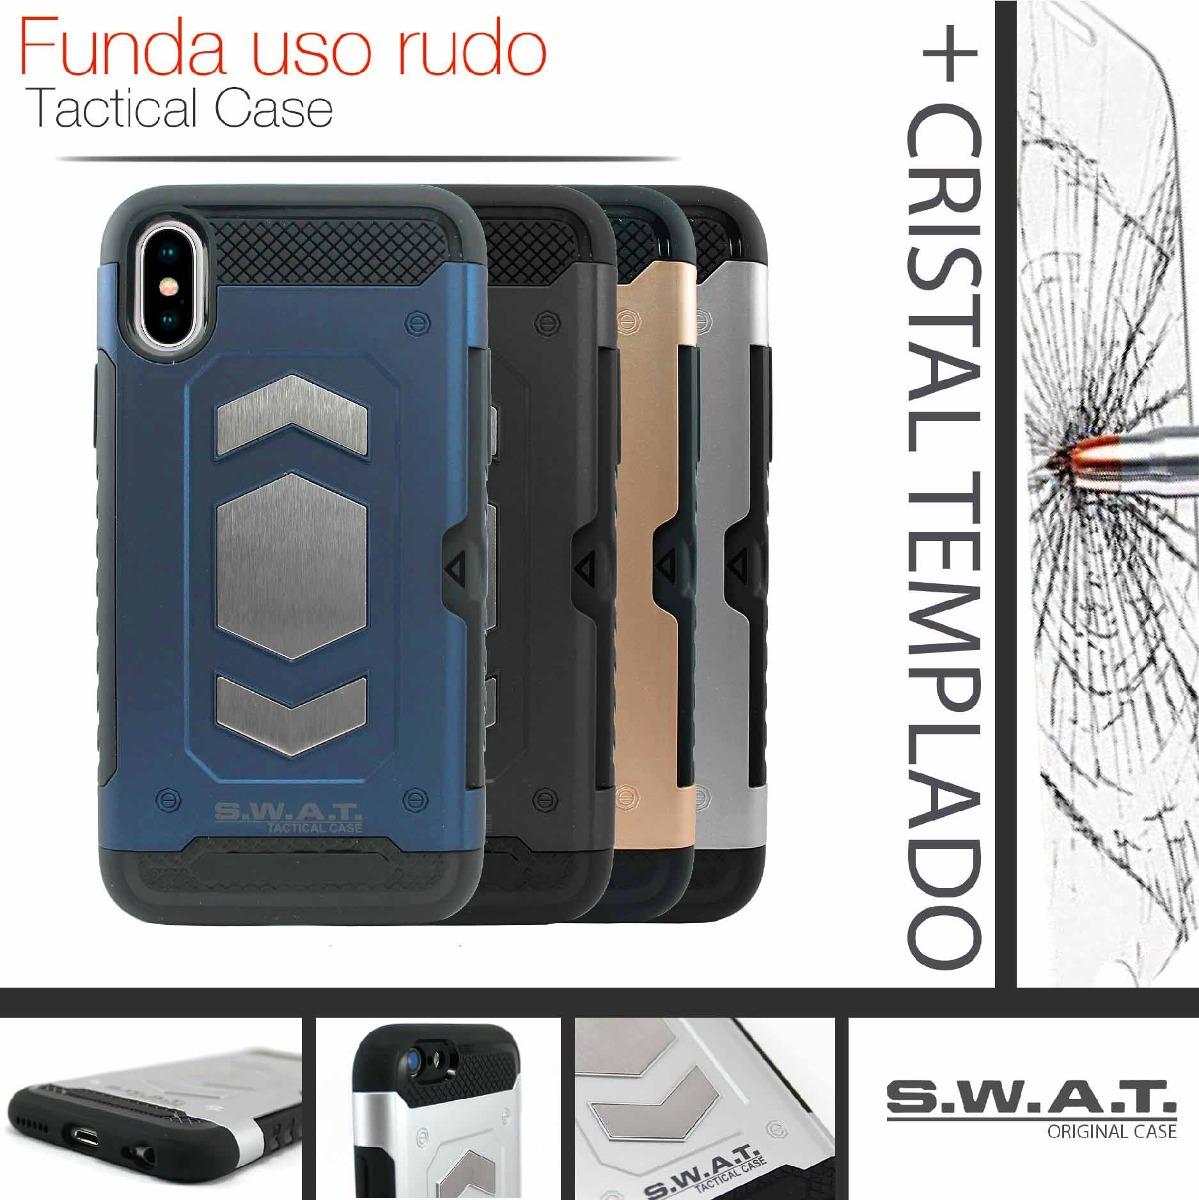 faf97add3d9 funda iphone x / xs uso rudo tarjetero magnetico + cristal. Cargando zoom.